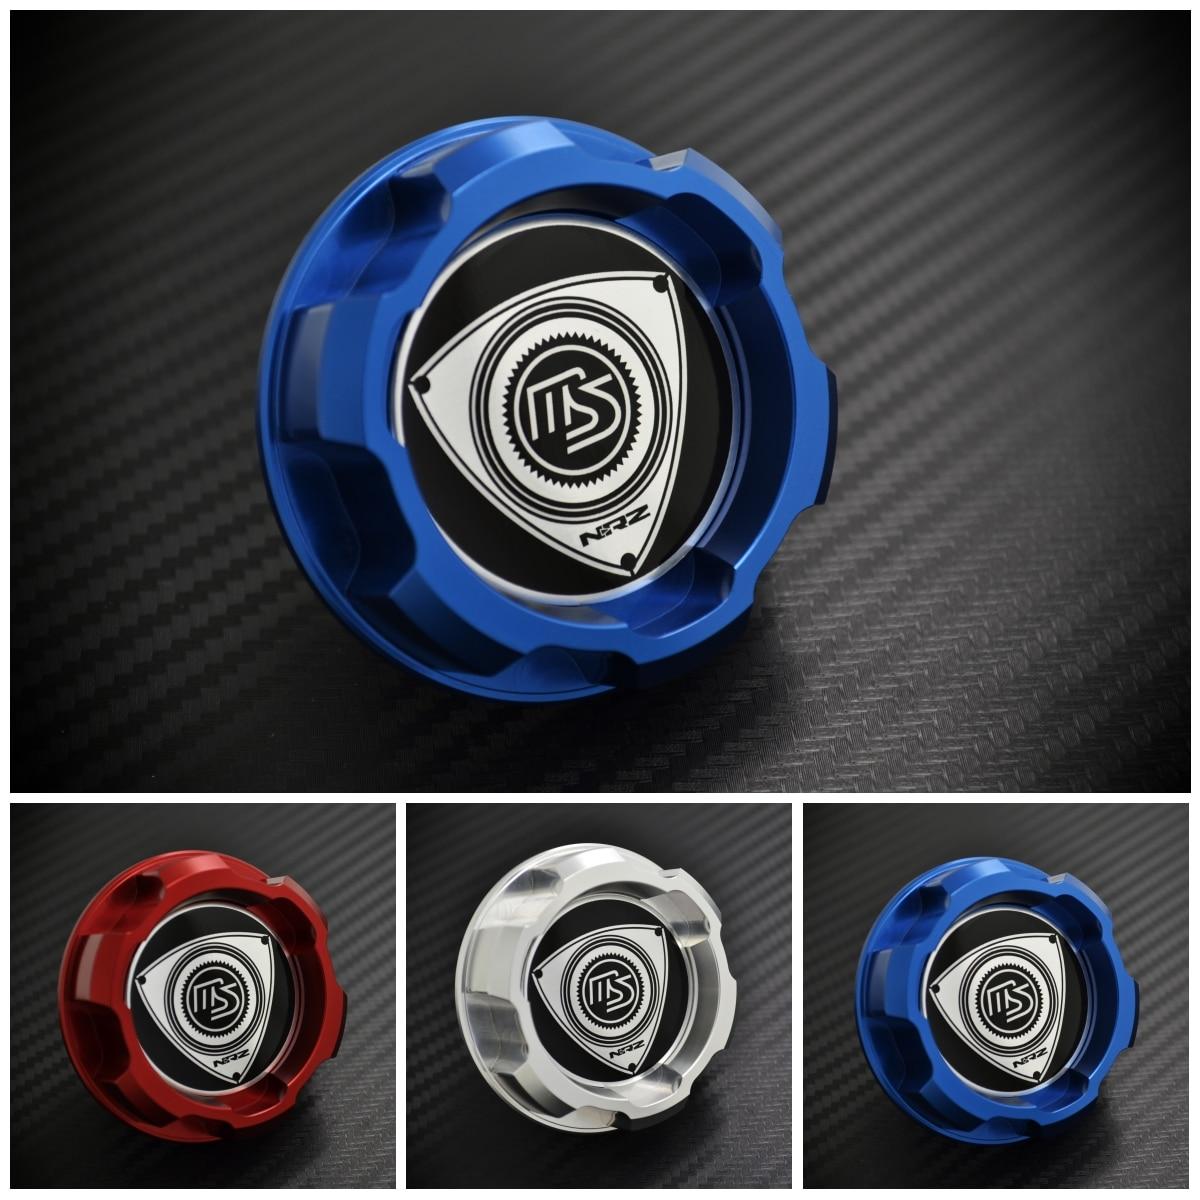 Aluminum ENGINE Oil Cap For MAZDA RX7 RX8 323 FAMILIA BP 1.8L PROTEGE FSDET MIATA MX5 MX-5